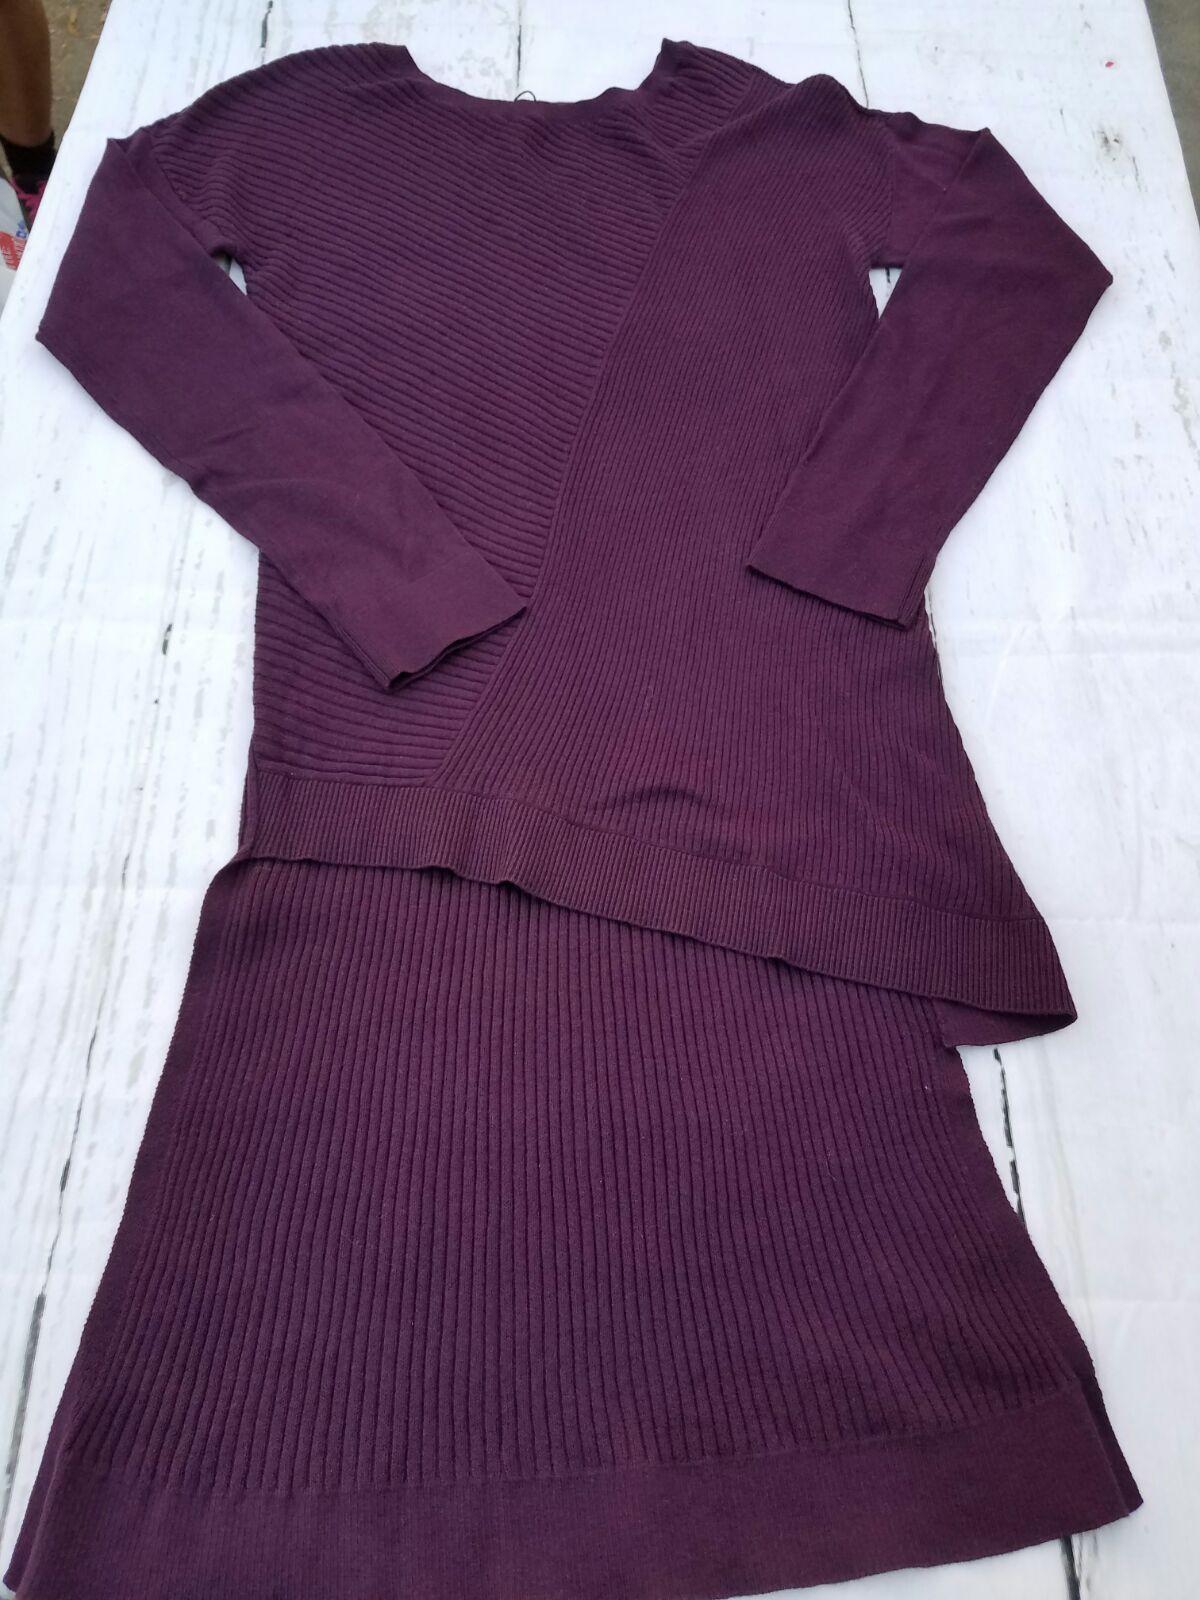 NWT Express purple long-sleeved sweater - Mercari: BUY & SELL ...